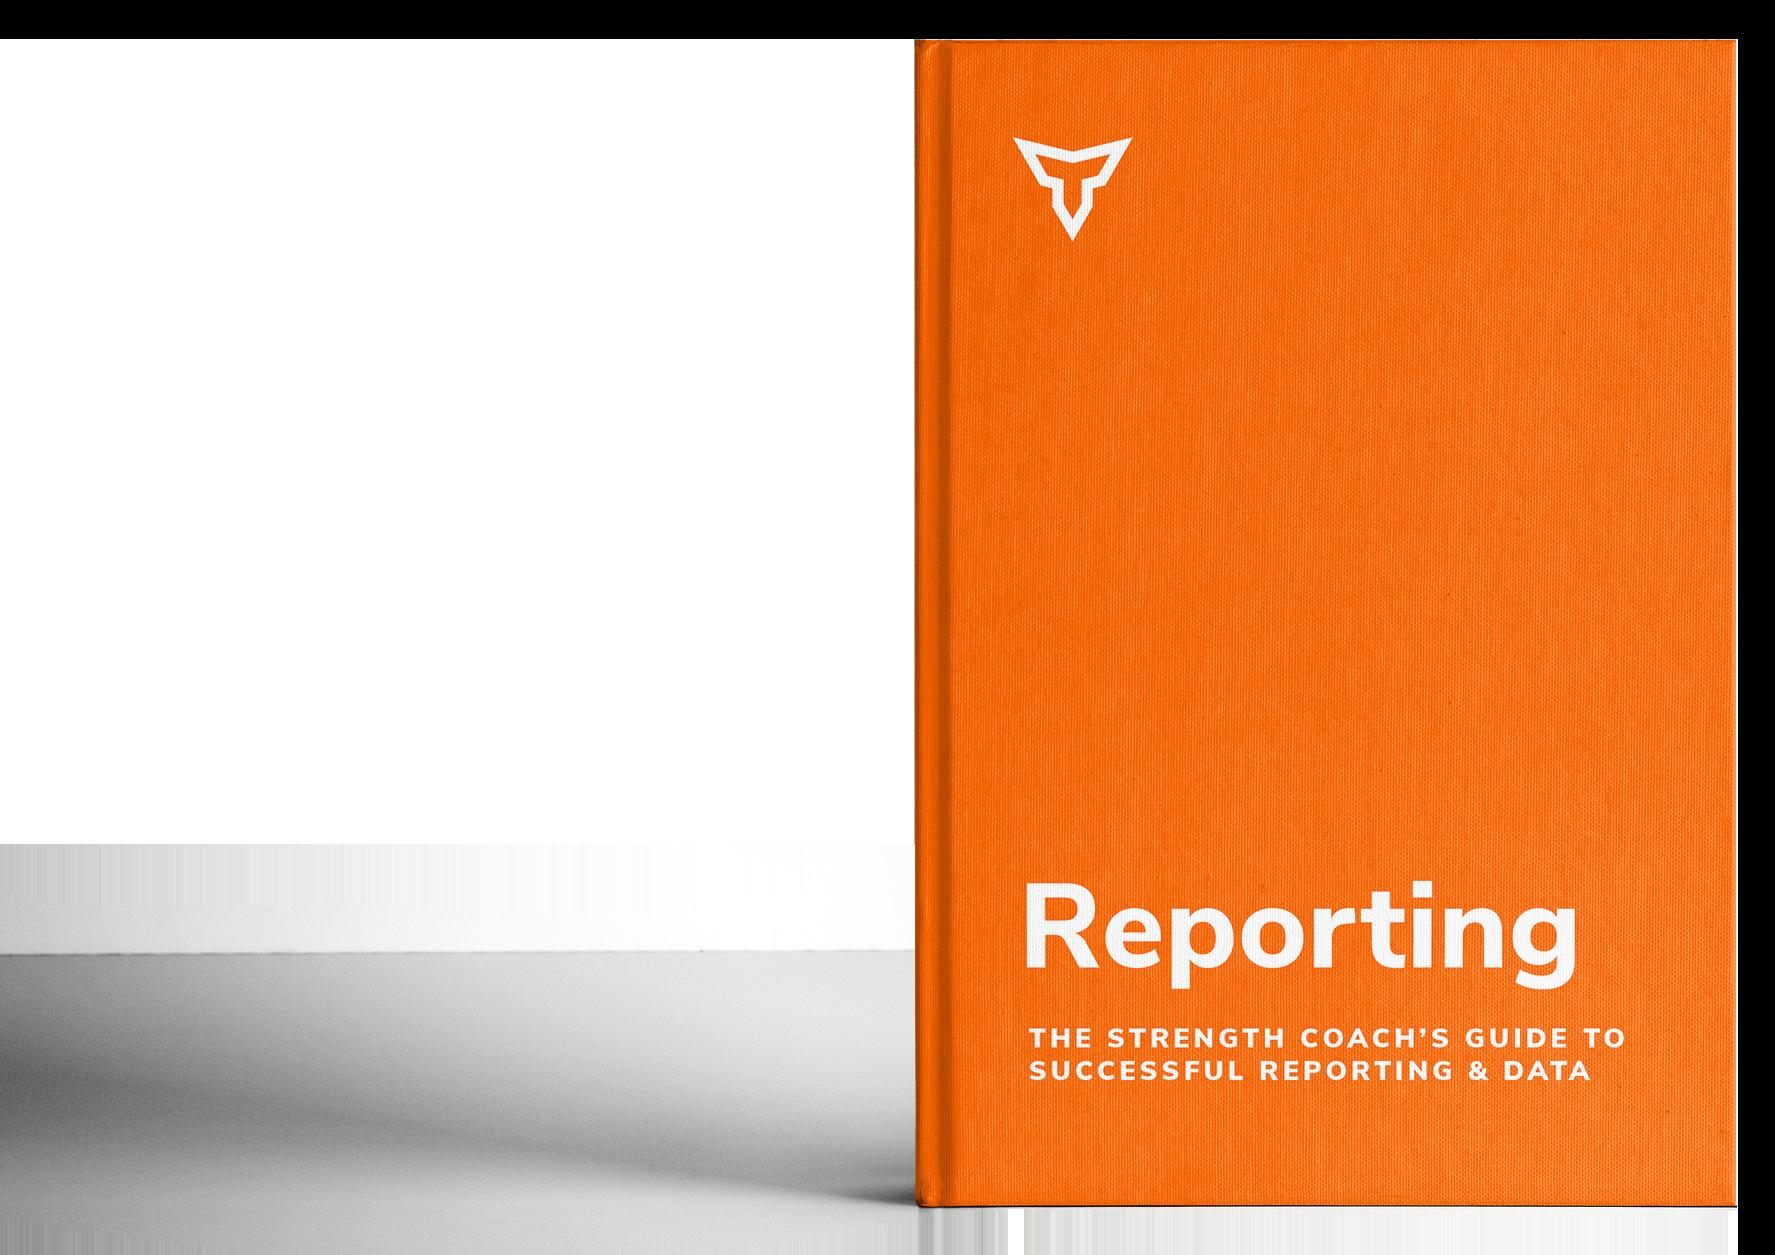 Reporting-Mockup-Transparent (no padding)